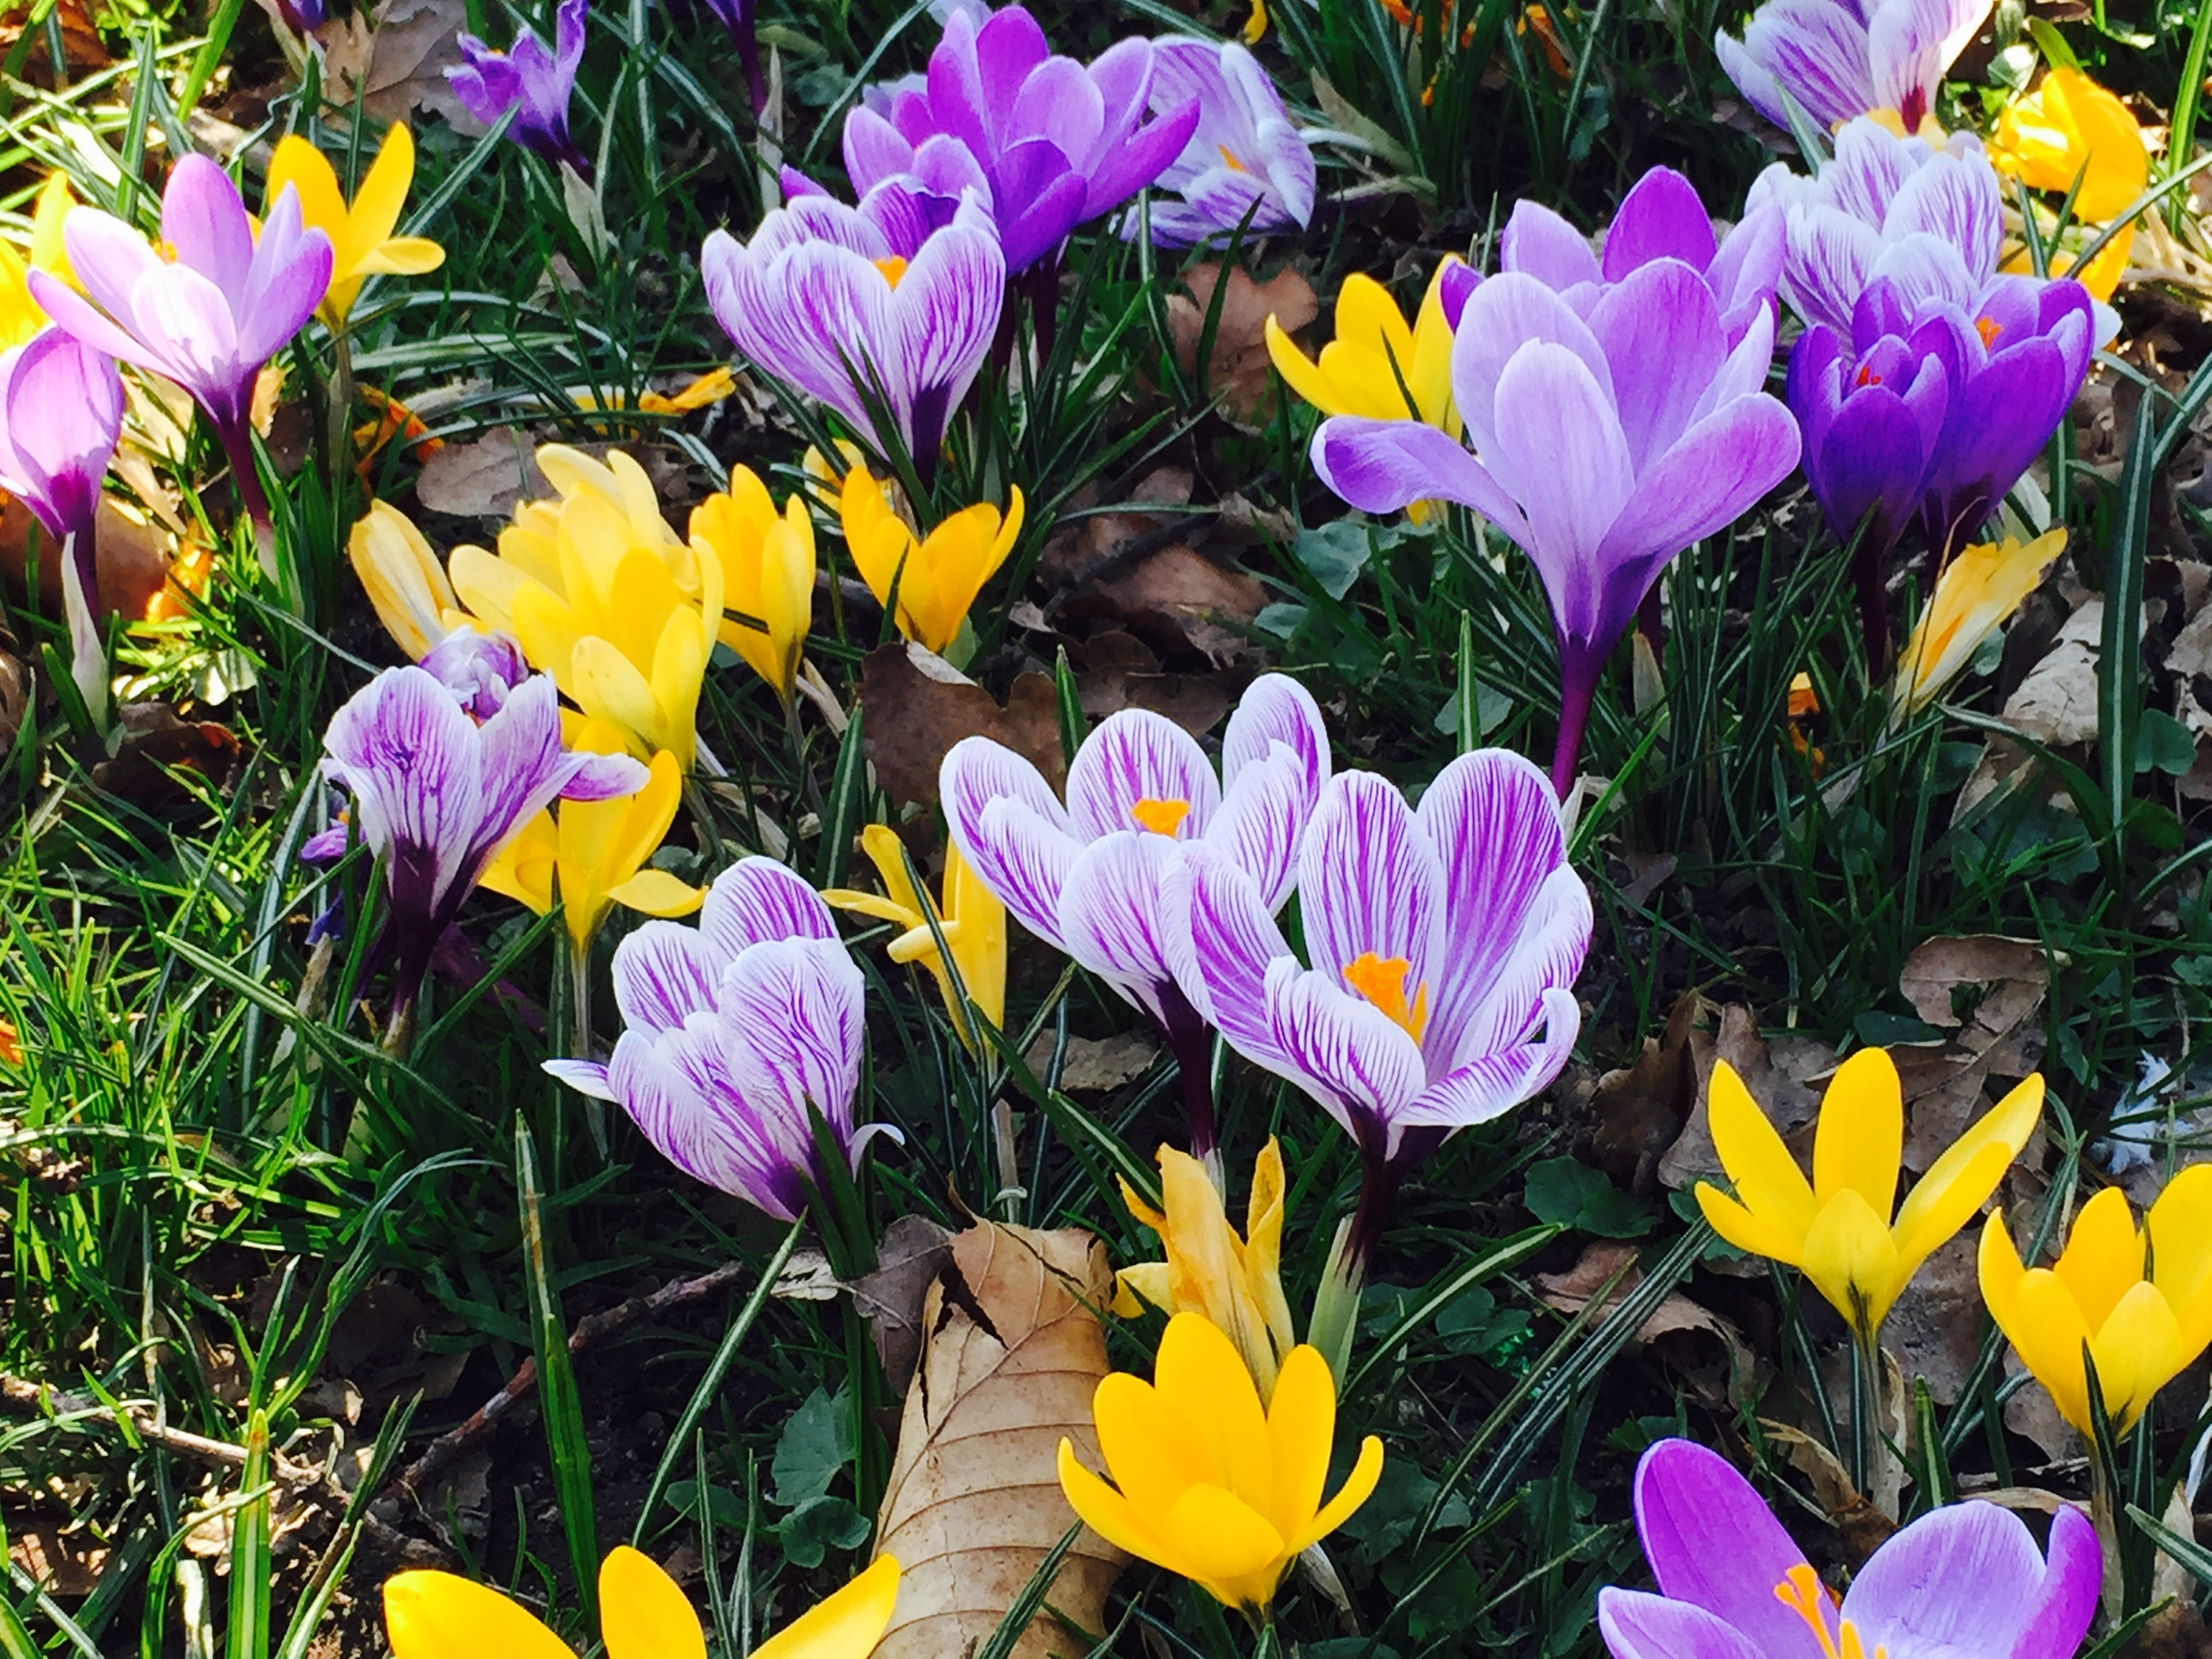 Spring_Crocuses_Free_Stock_image